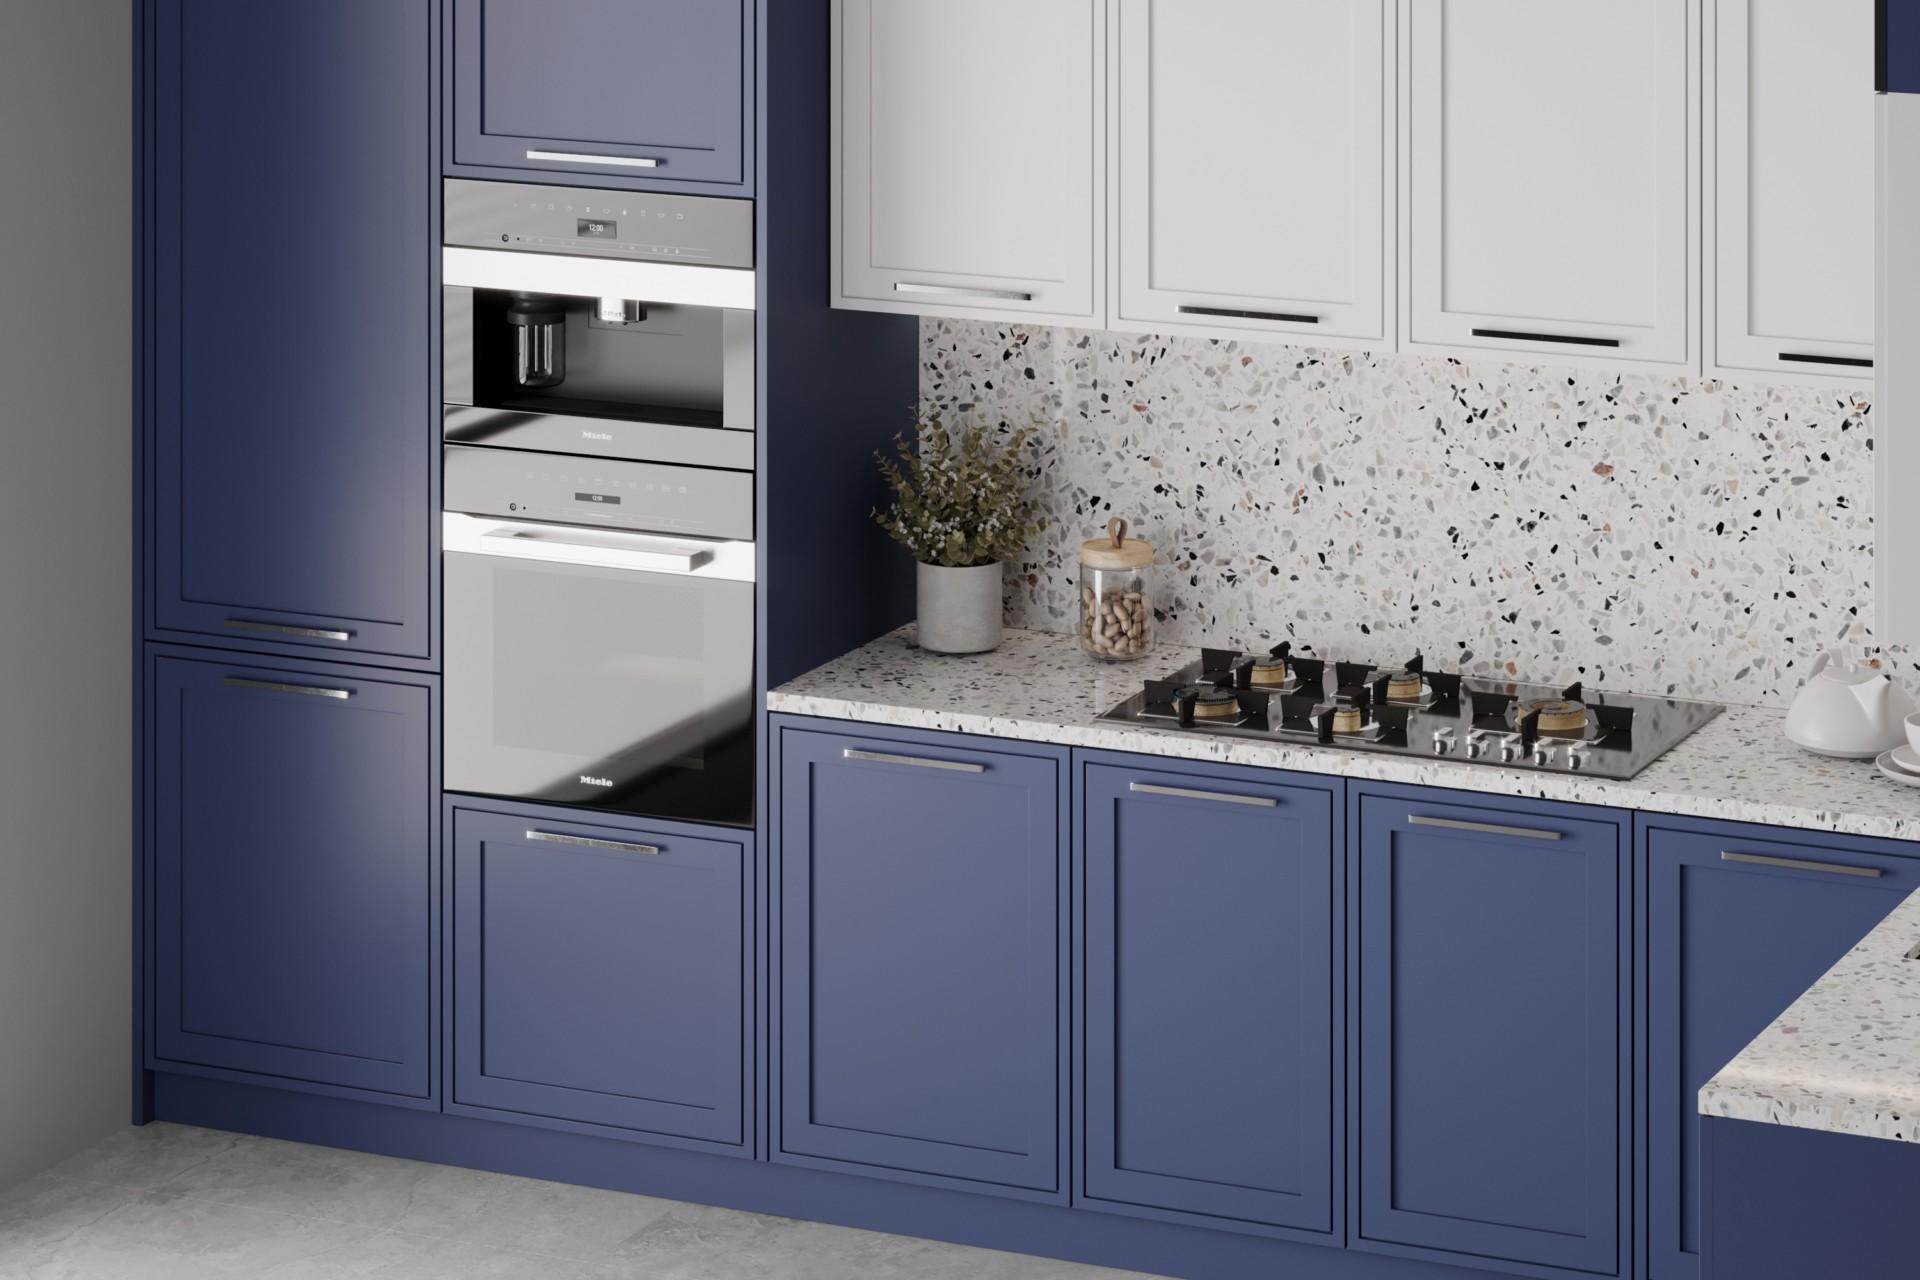 Шейкер шкафы для кухни